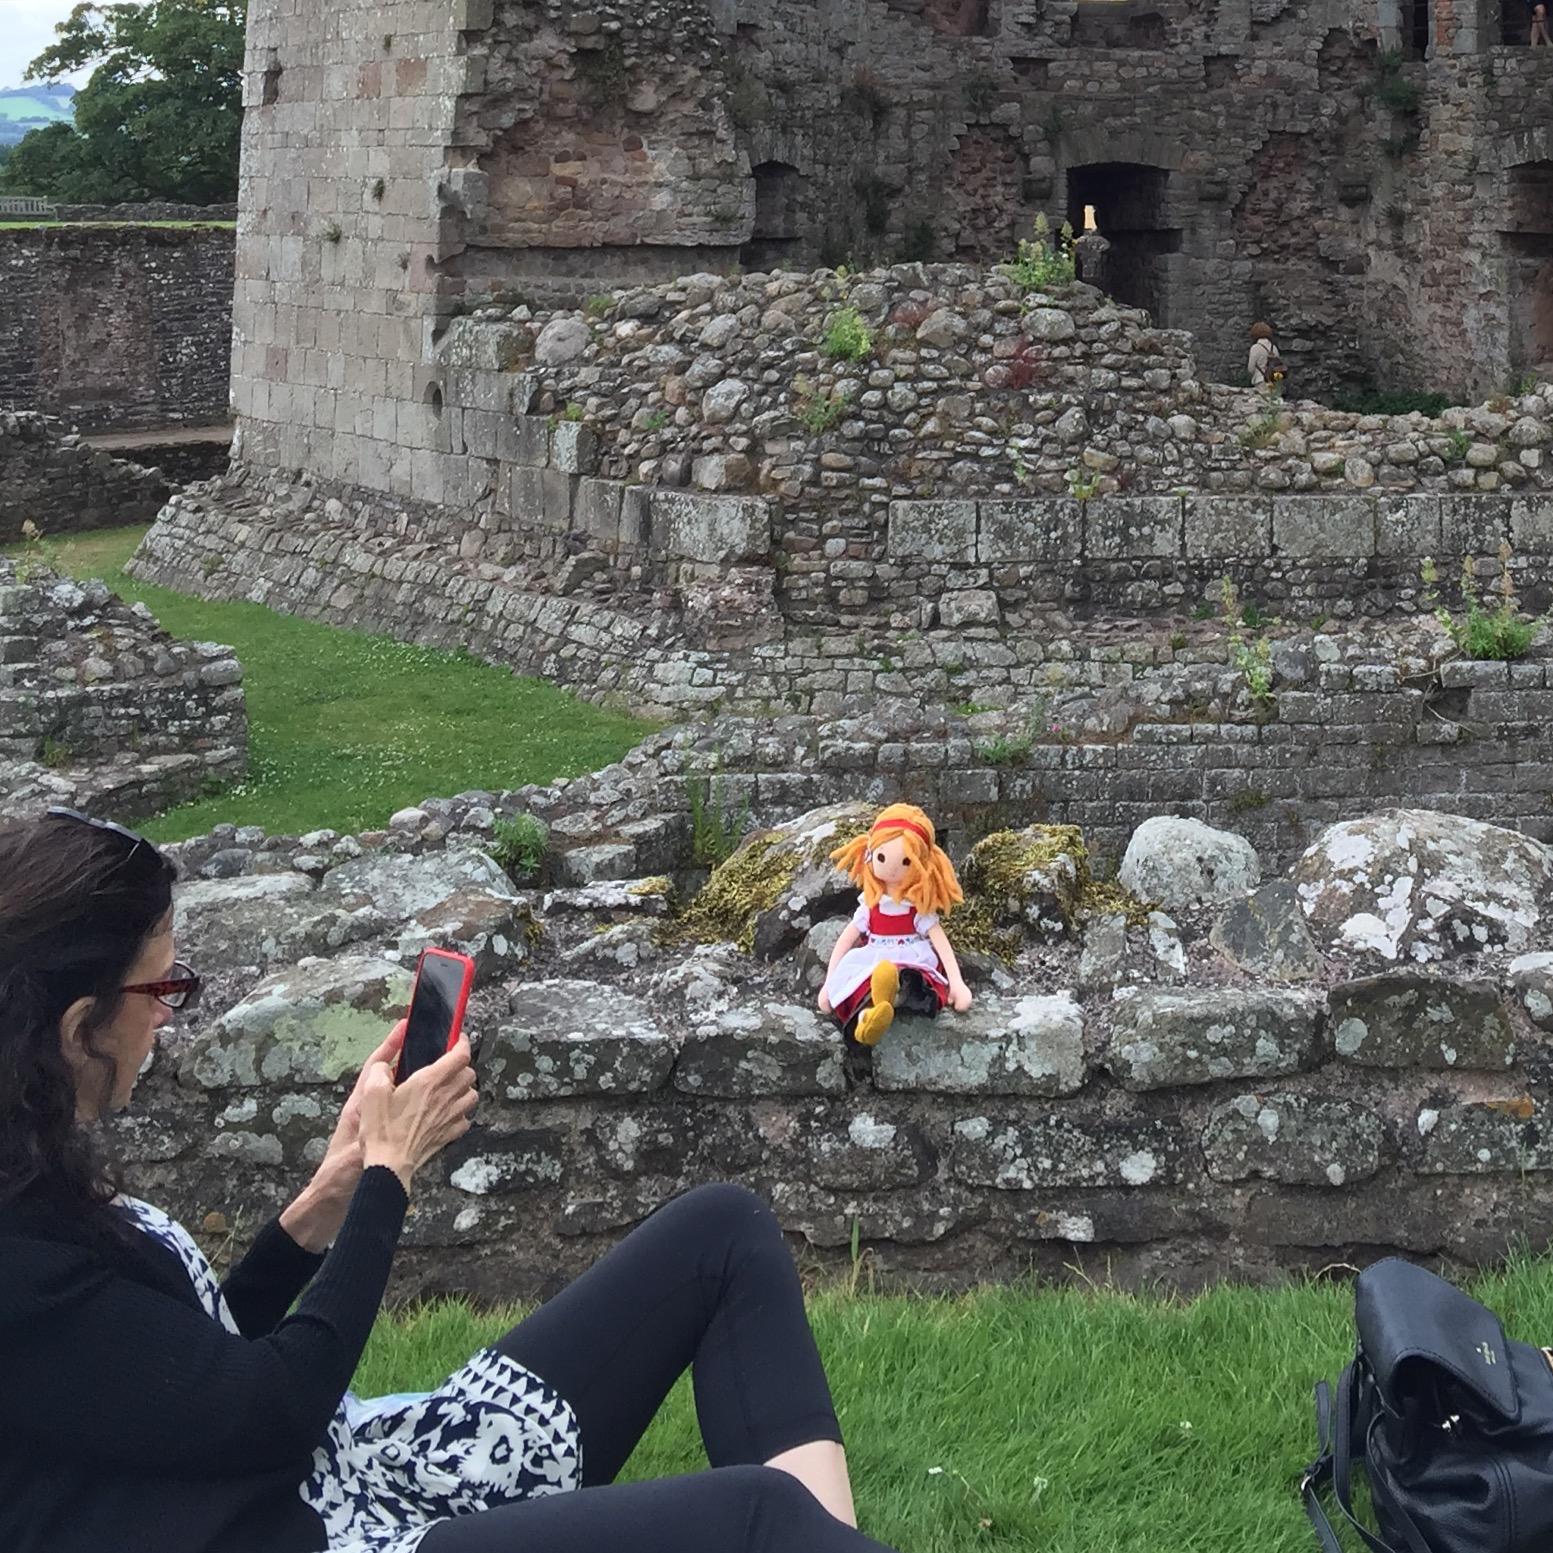 Phoebe goes to Raglan Castle